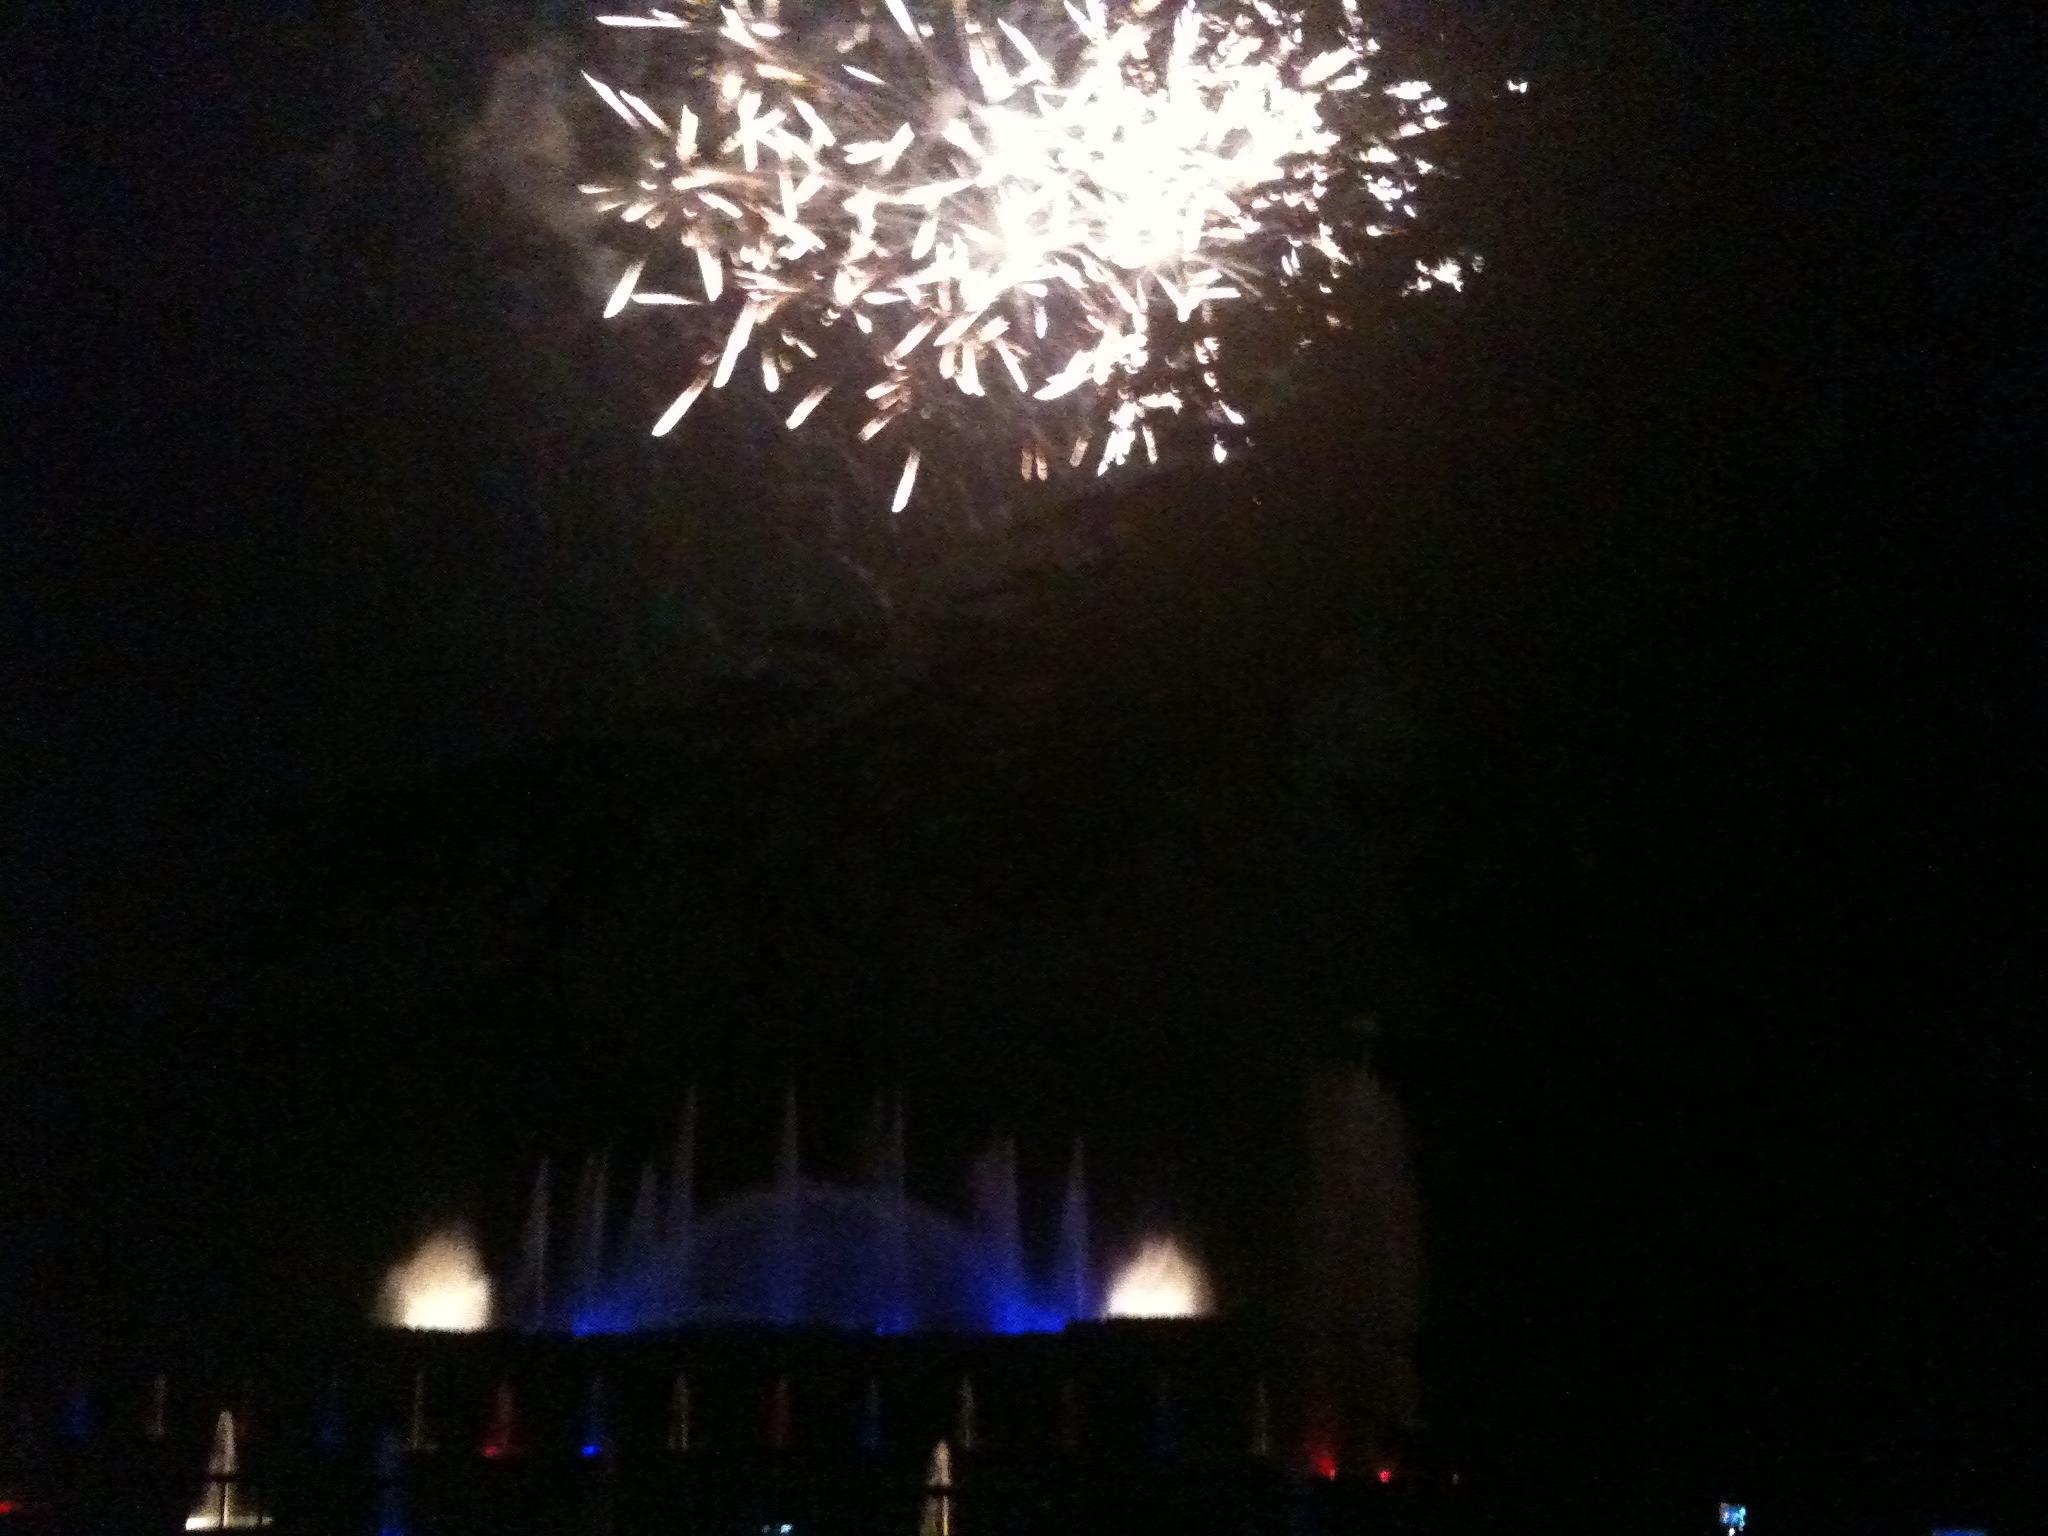 Longwood Gardens - Fountains & Fireworks - Mobile Photos